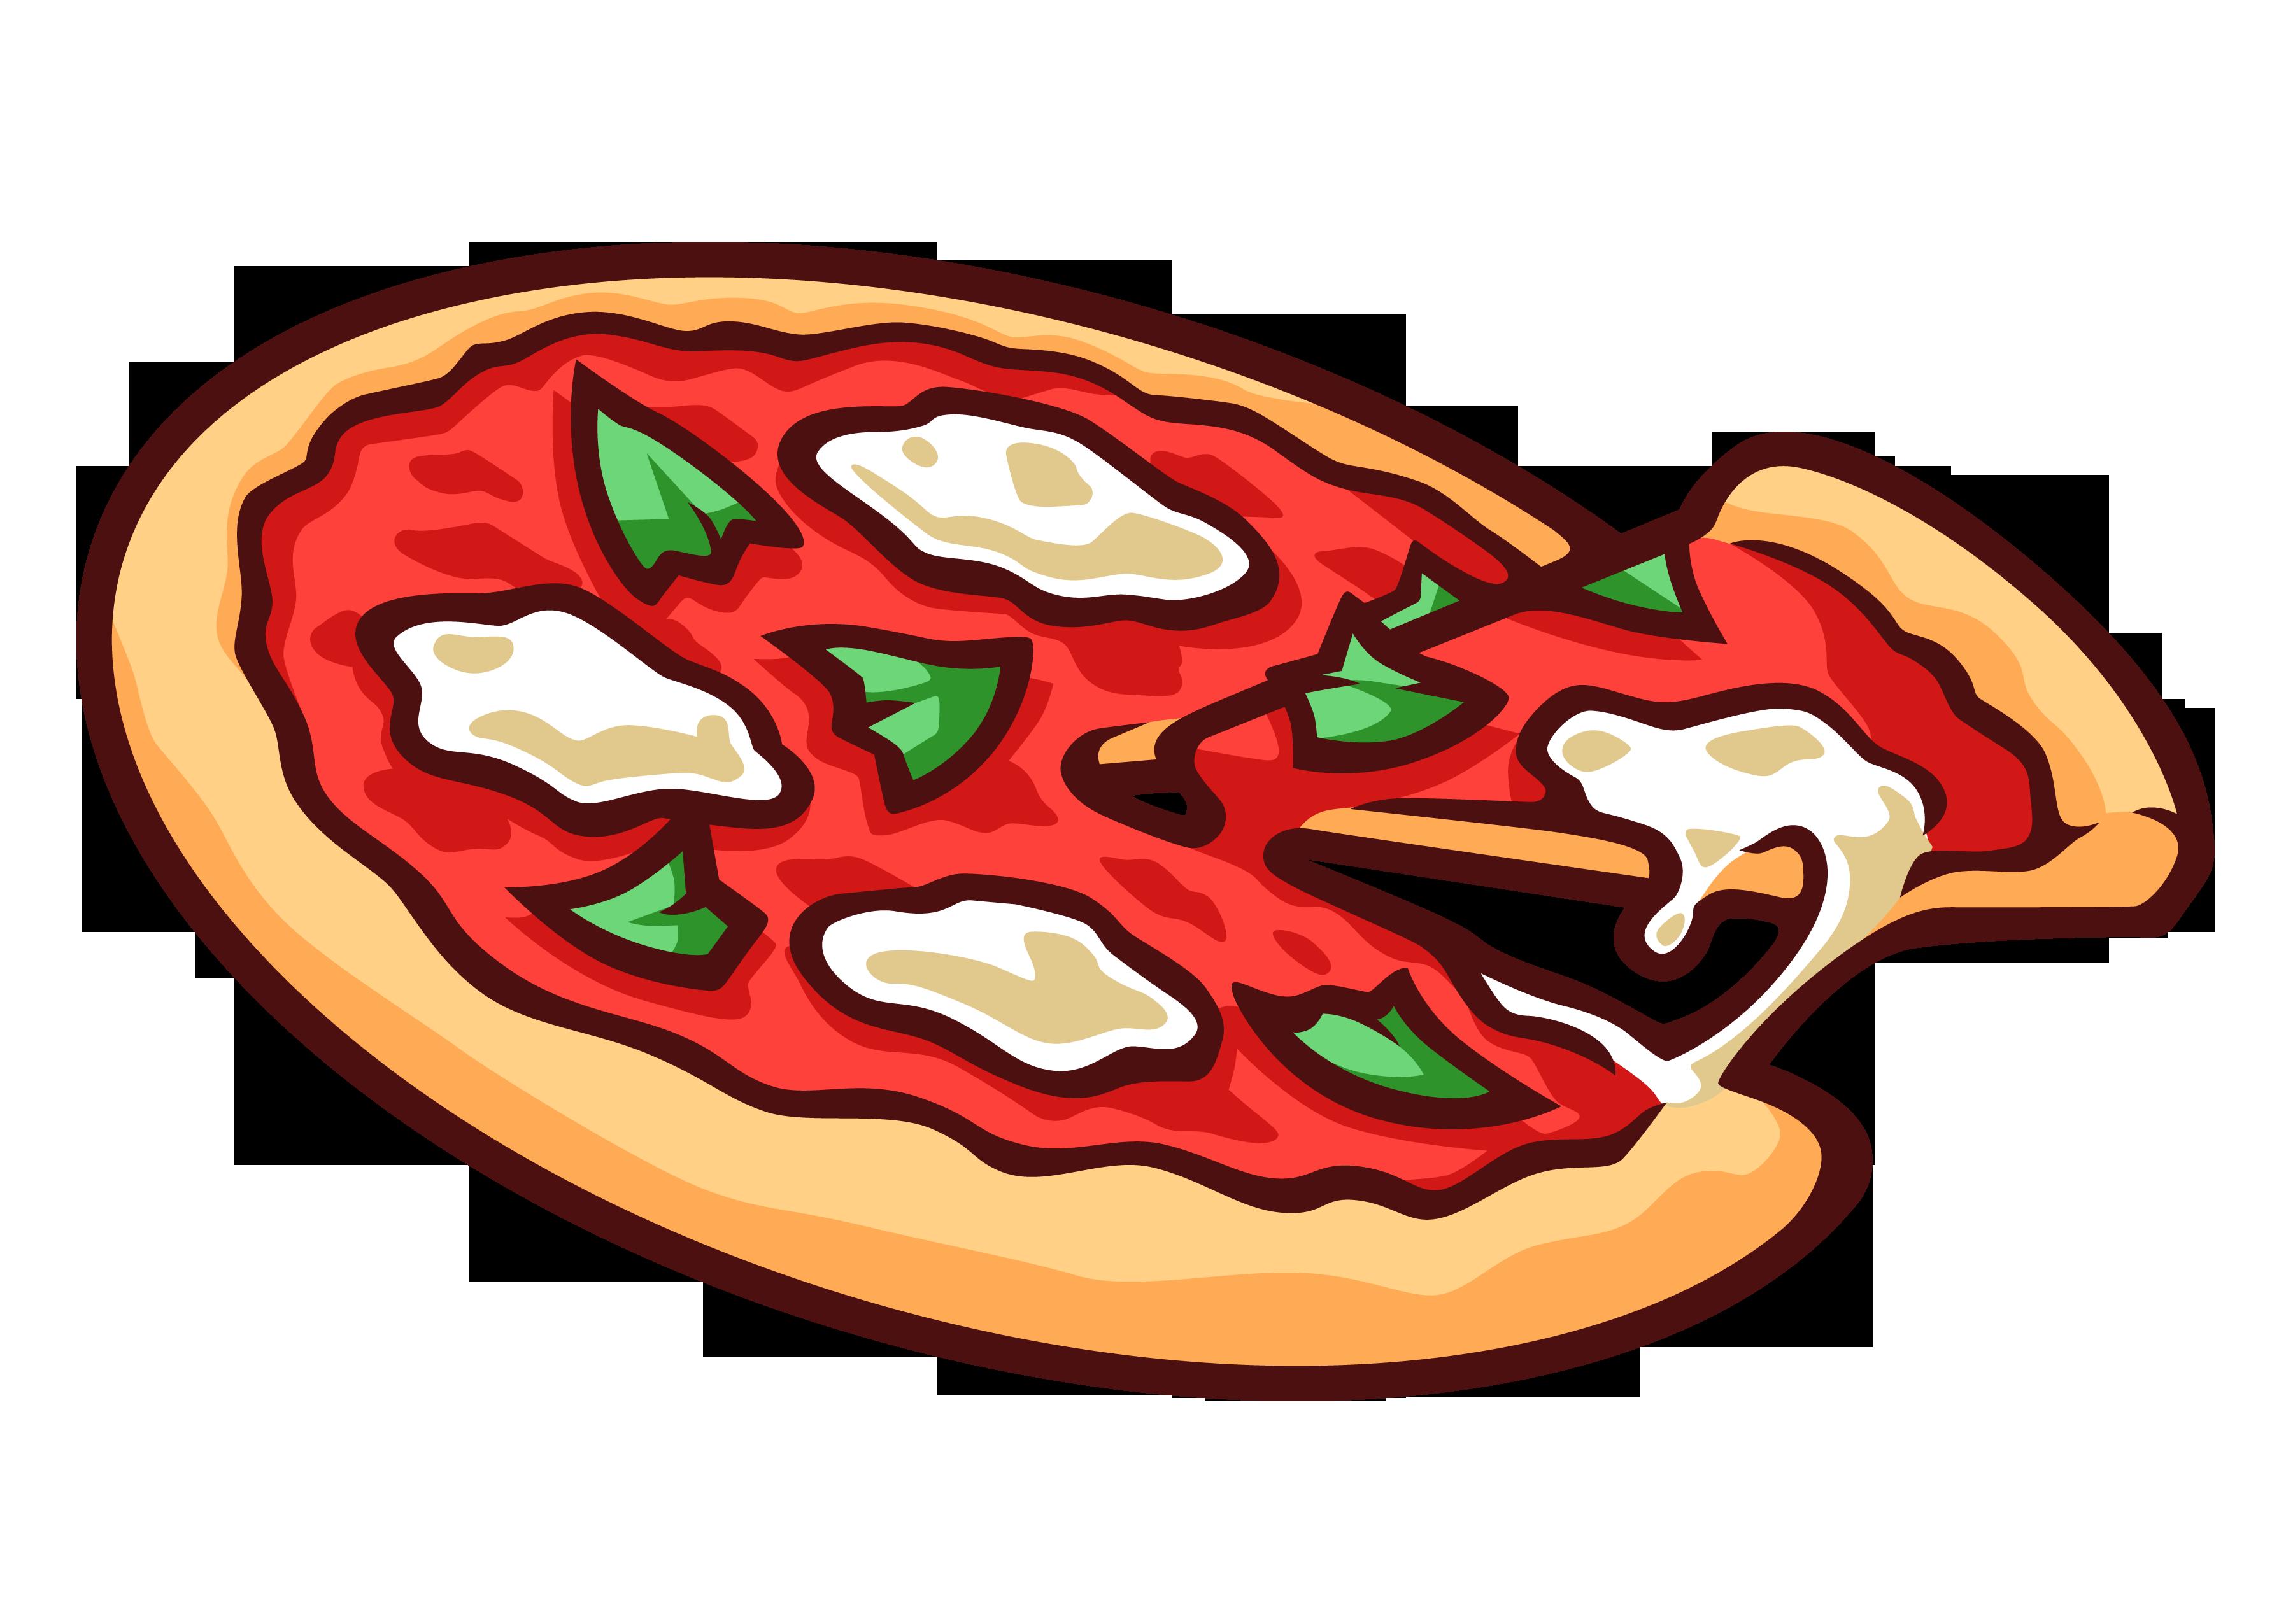 3579x2551 Vector Clipart Pizza